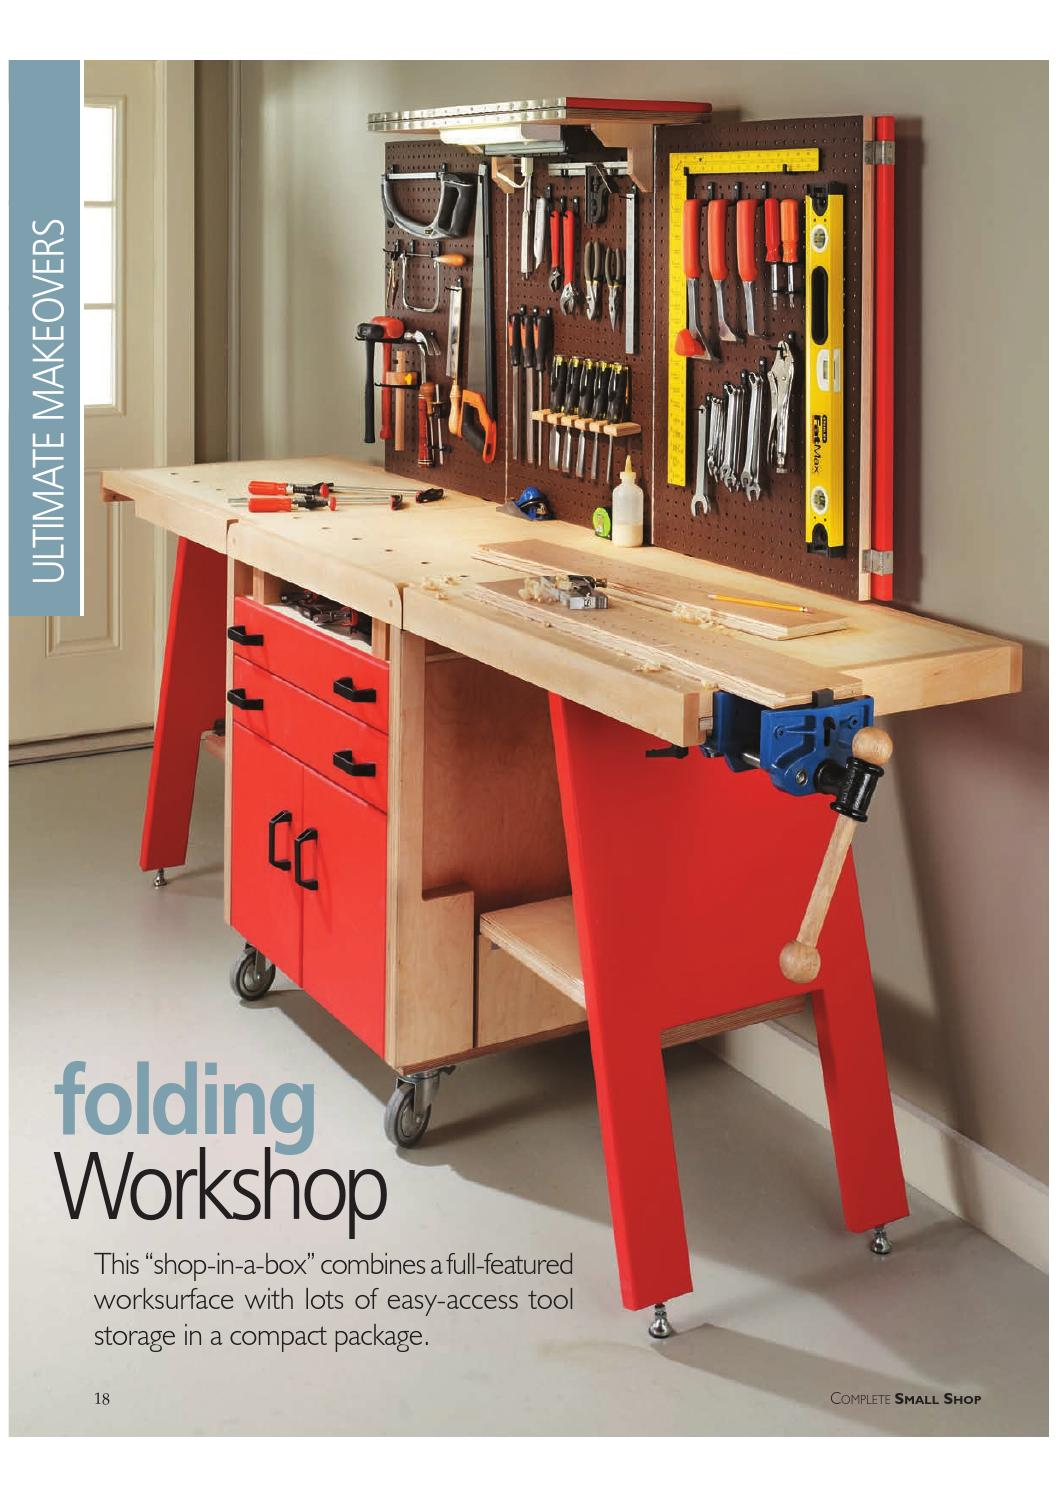 Folding Workshop By Woodworker Issuu